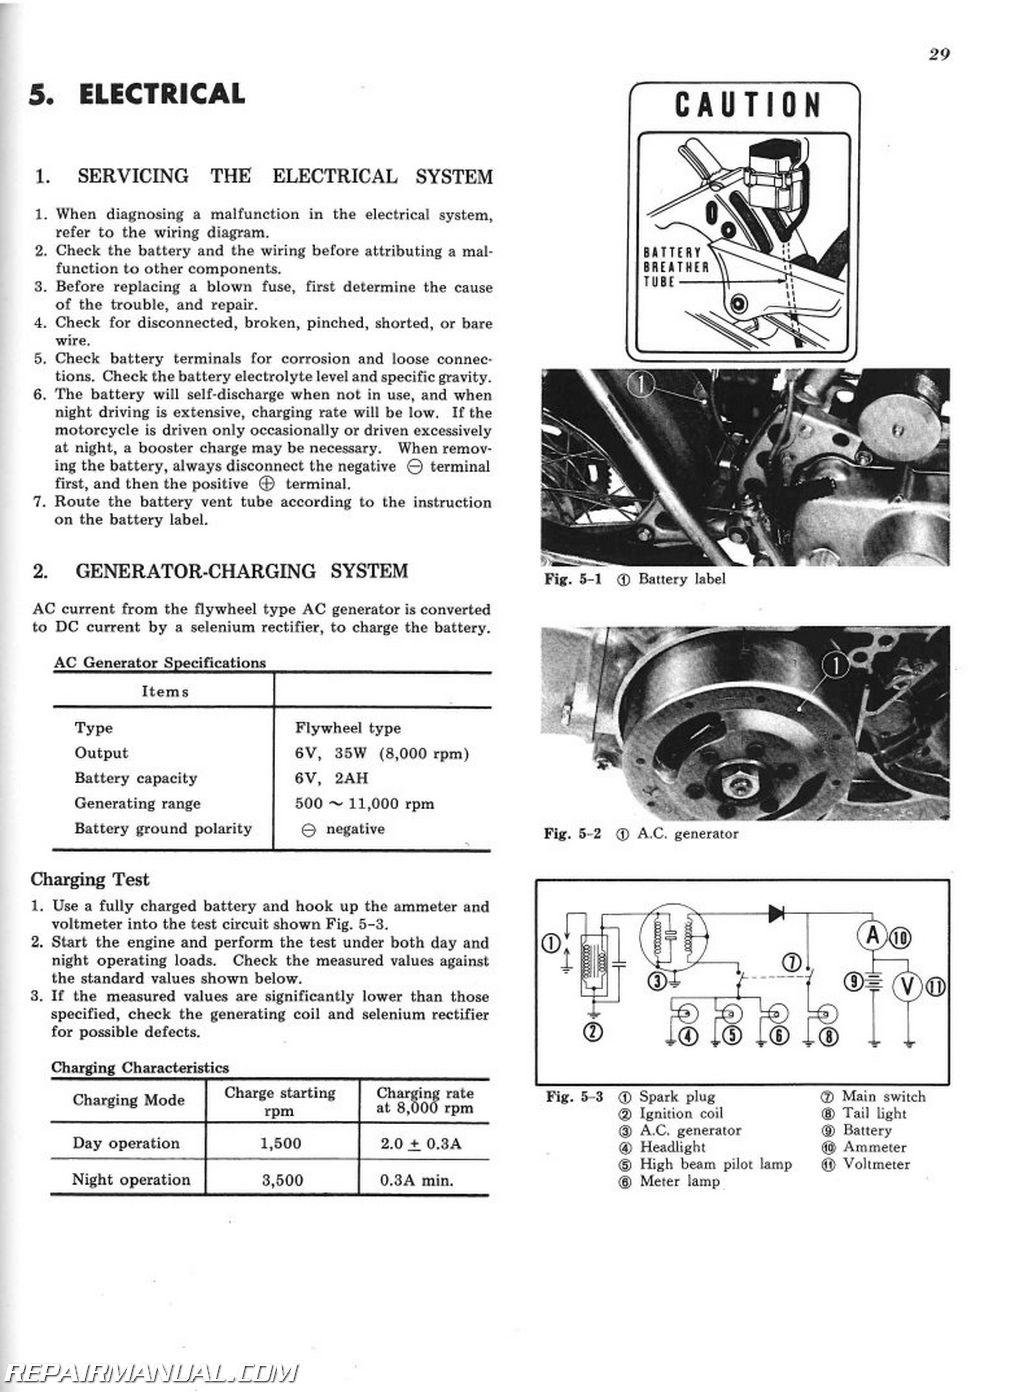 1971-1976 honda sl70 xl70 service manual